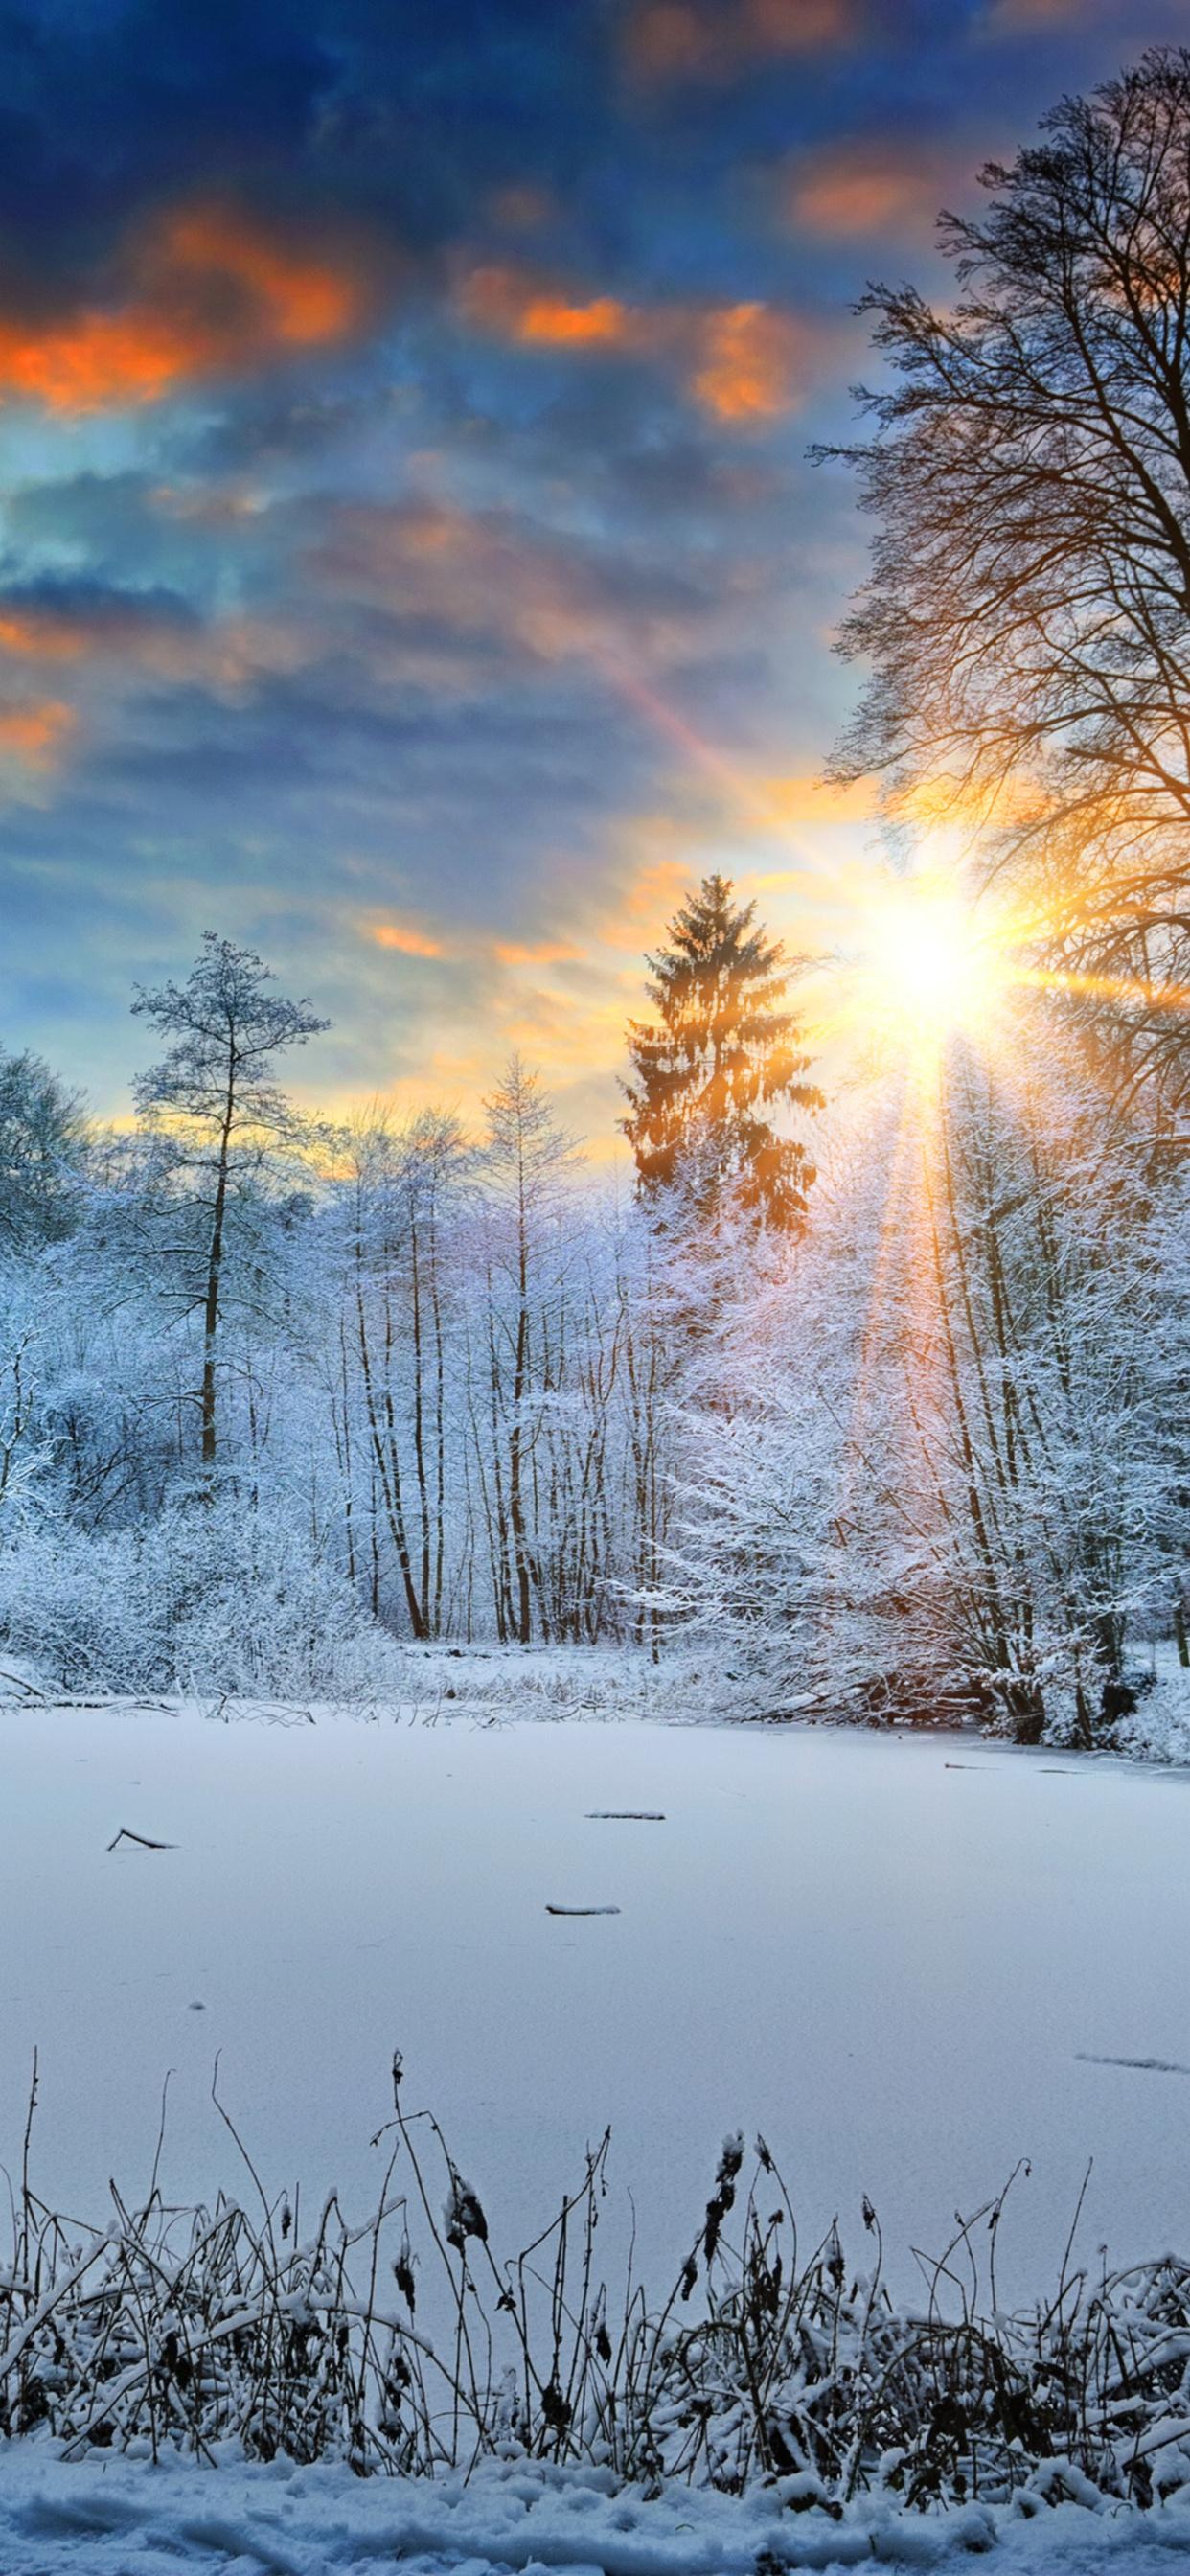 1242x2688 Sunbeams Landscape Snow In Winter Trees 4k Iphone Xs Max